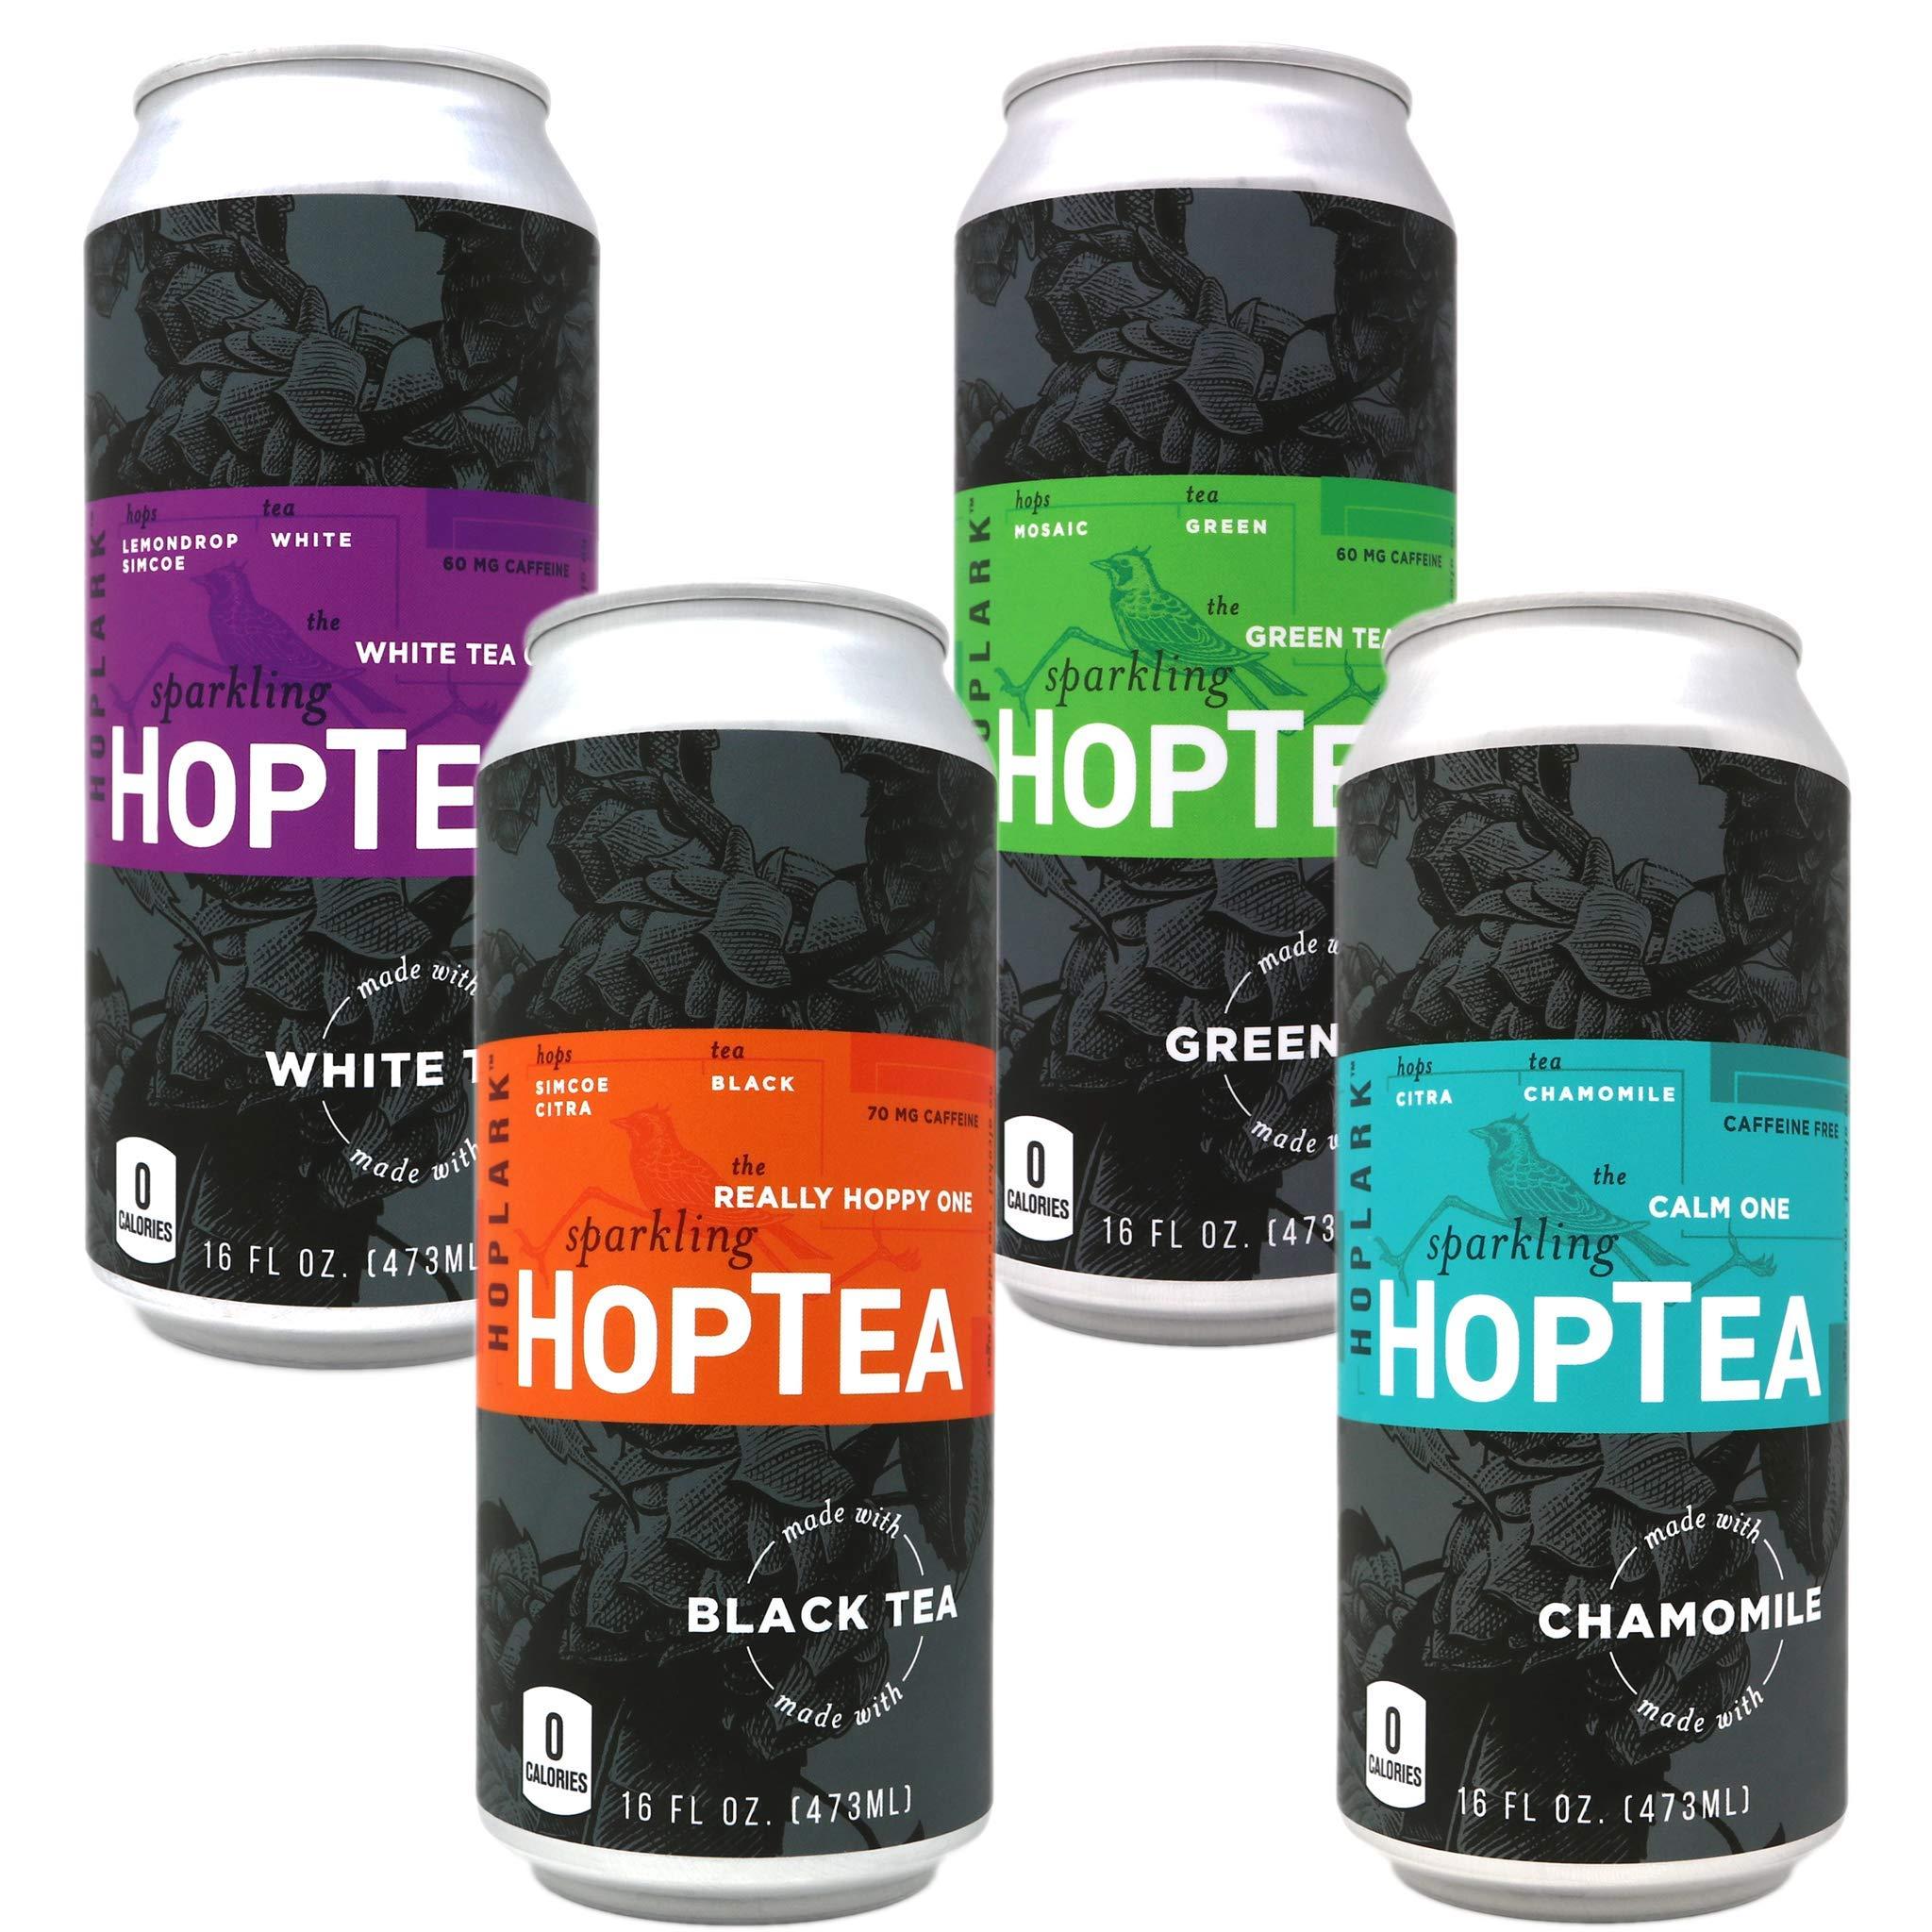 Hoplark HopTea - The Core Mixed Pack - 12 - 16oz Cans by Hoplark HopTea